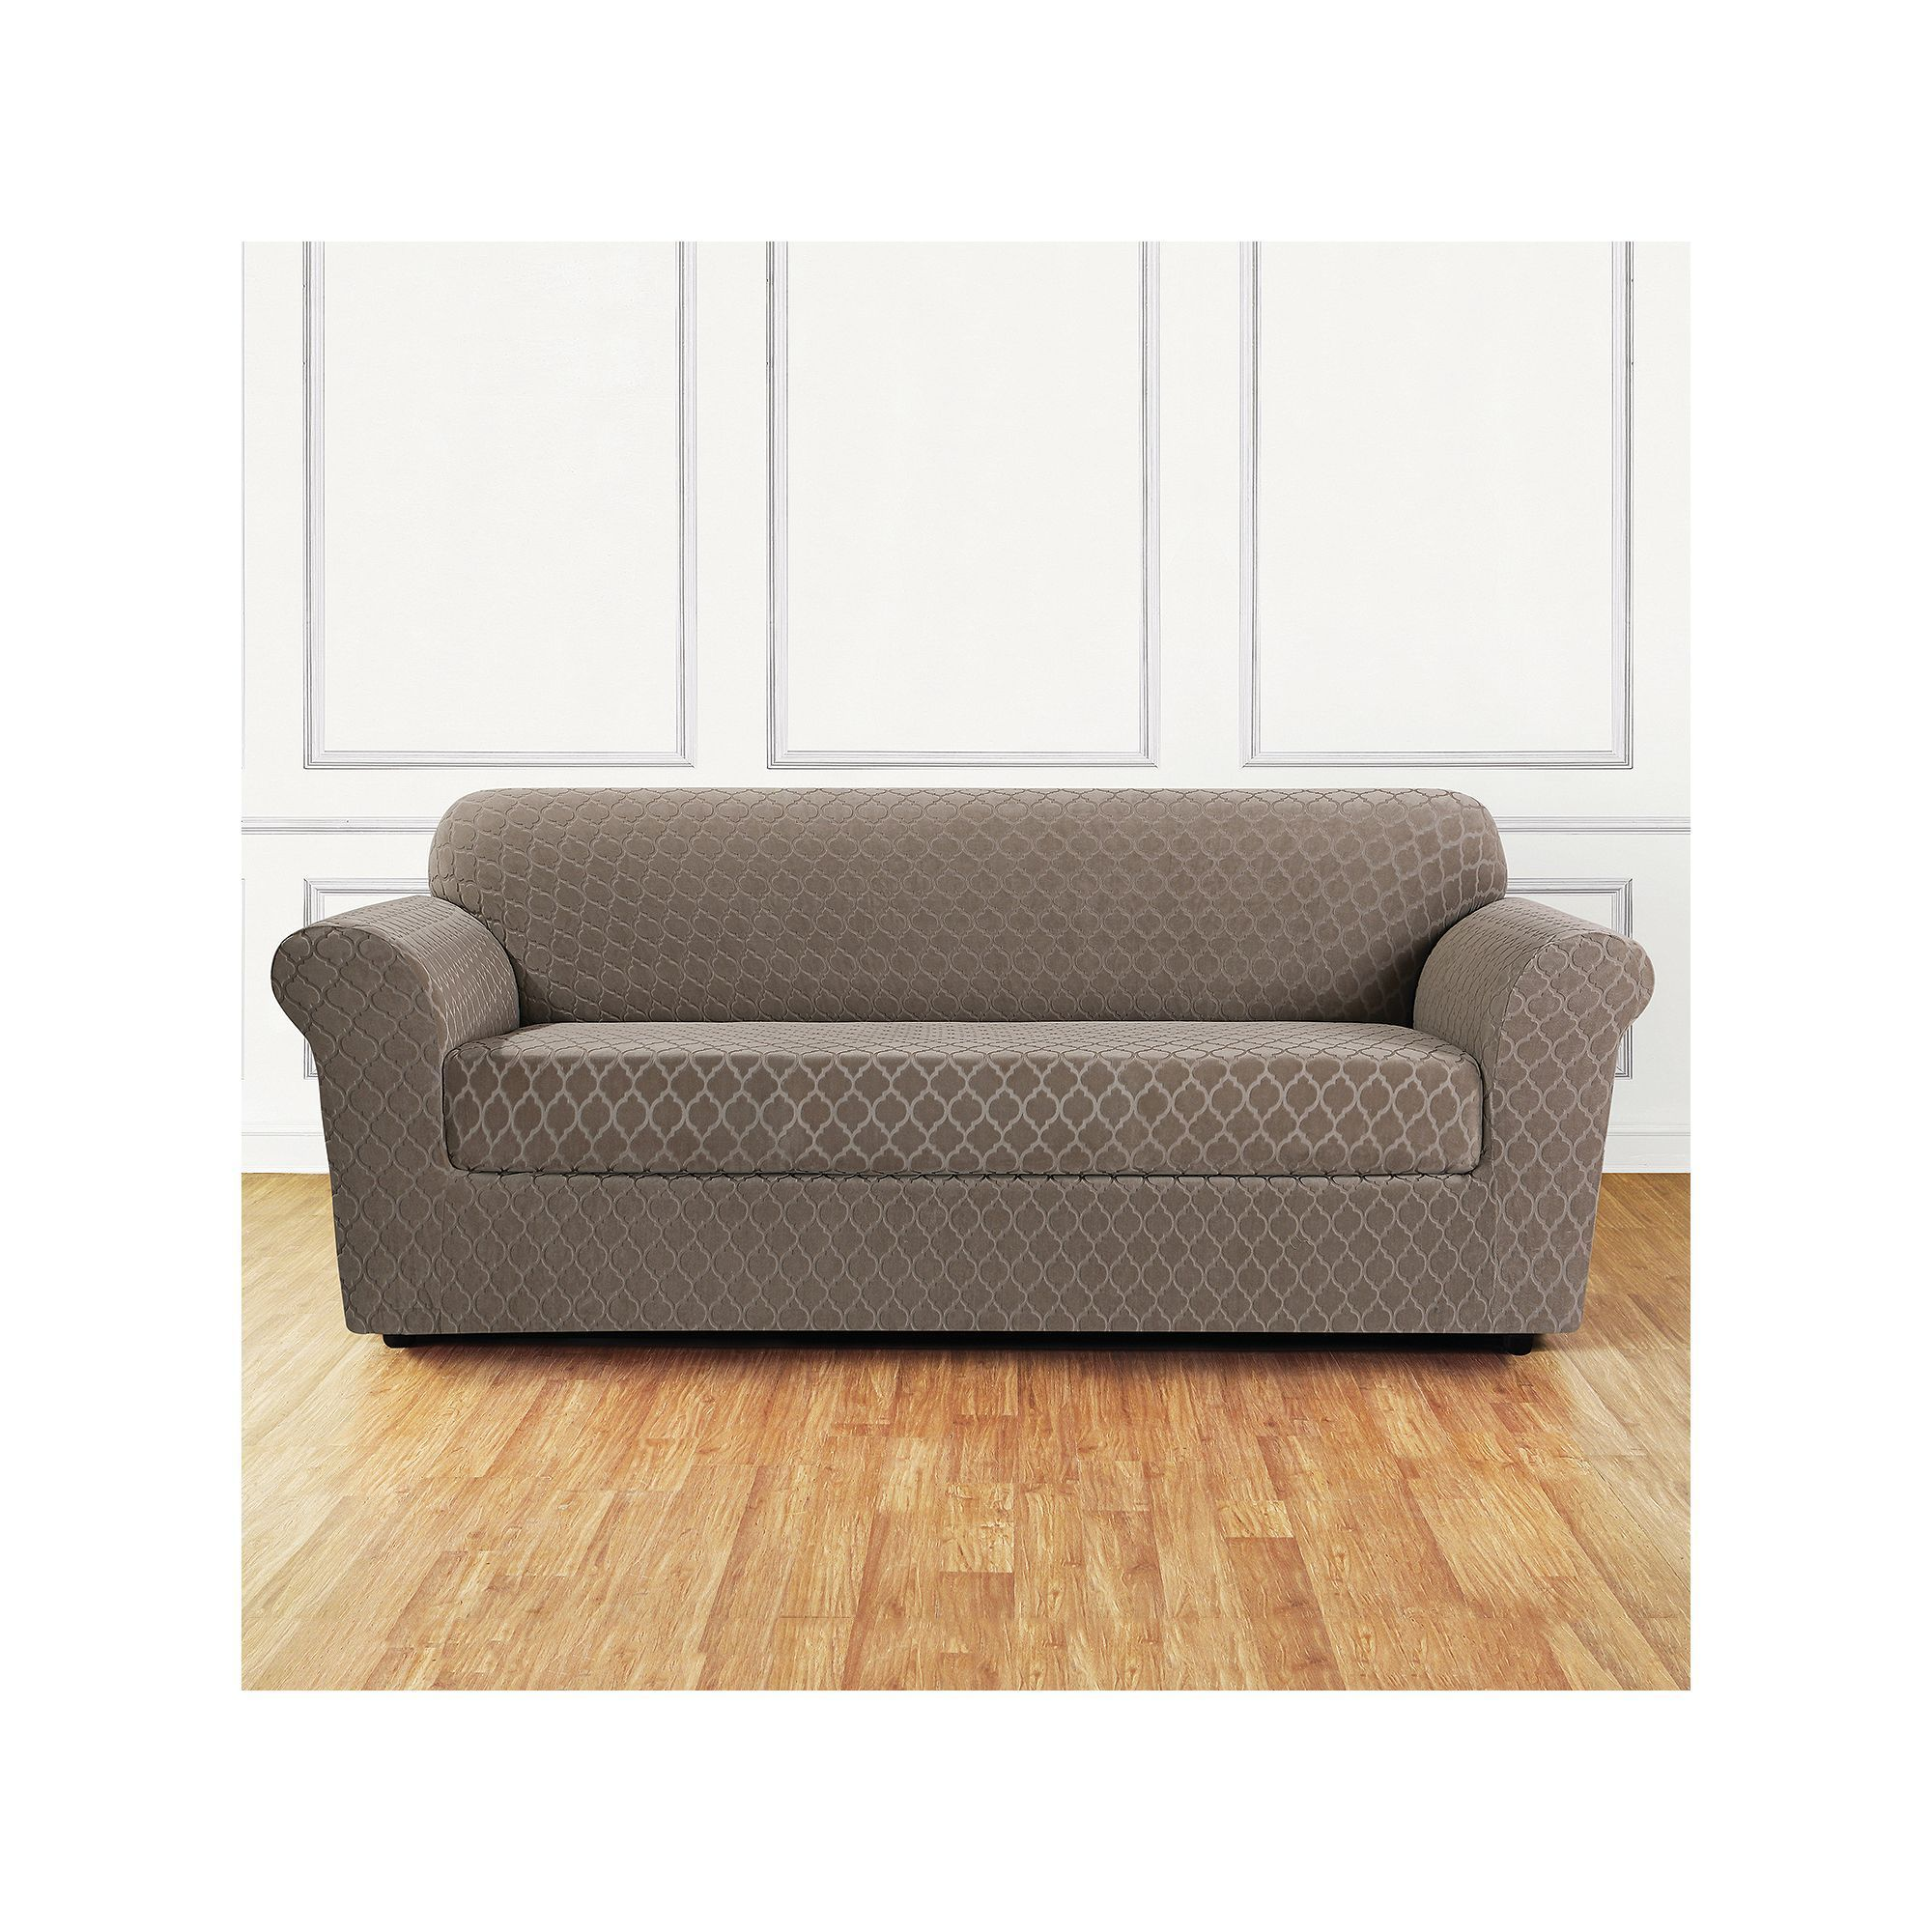 Stretch Metro Box Cushion Sofa Slipcover Slipcovered Sofa Cushions On Sofa Loveseat Slipcovers